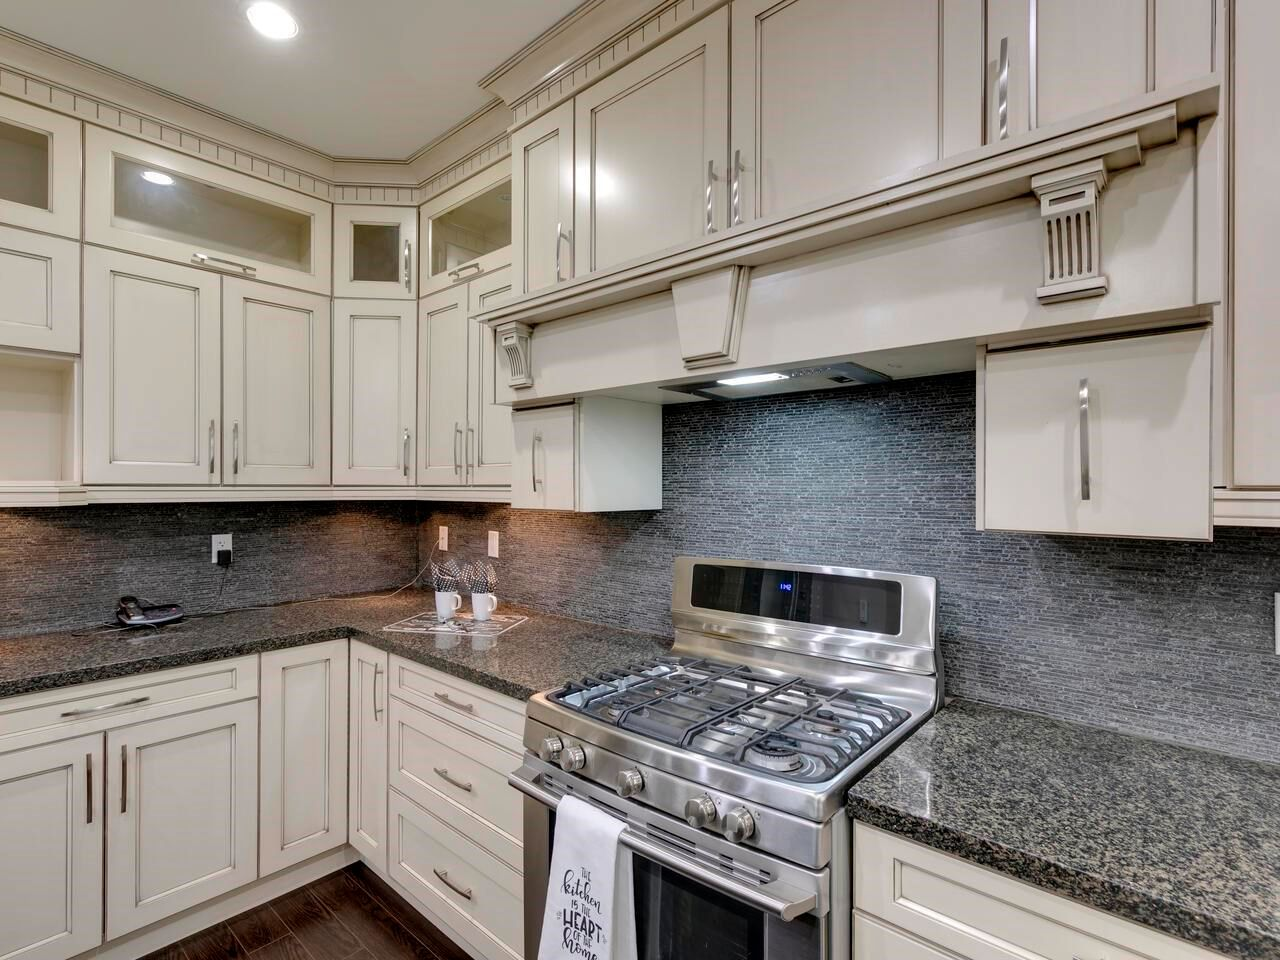 "Photo 10: Photos: 22845 126B Avenue in Maple Ridge: East Central House for sale in ""EAST CENTRAL MAPLE RIDGE"" : MLS®# R2594638"